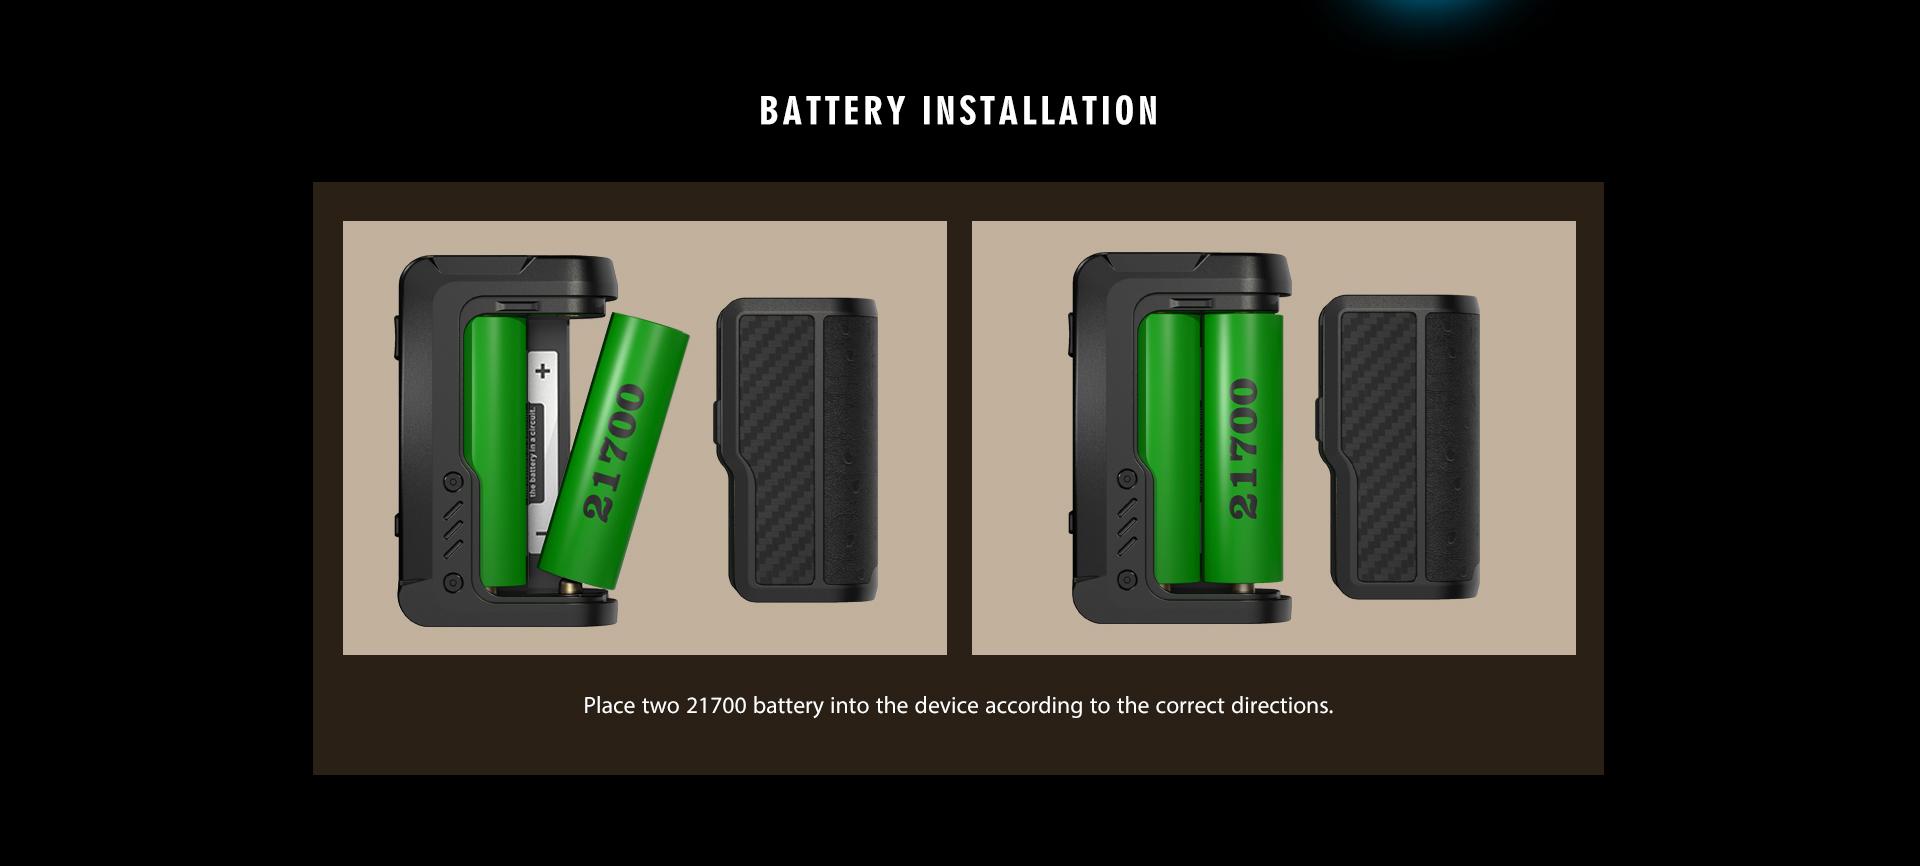 Vandy Vape Gaur-21 Mod - Battery Installation